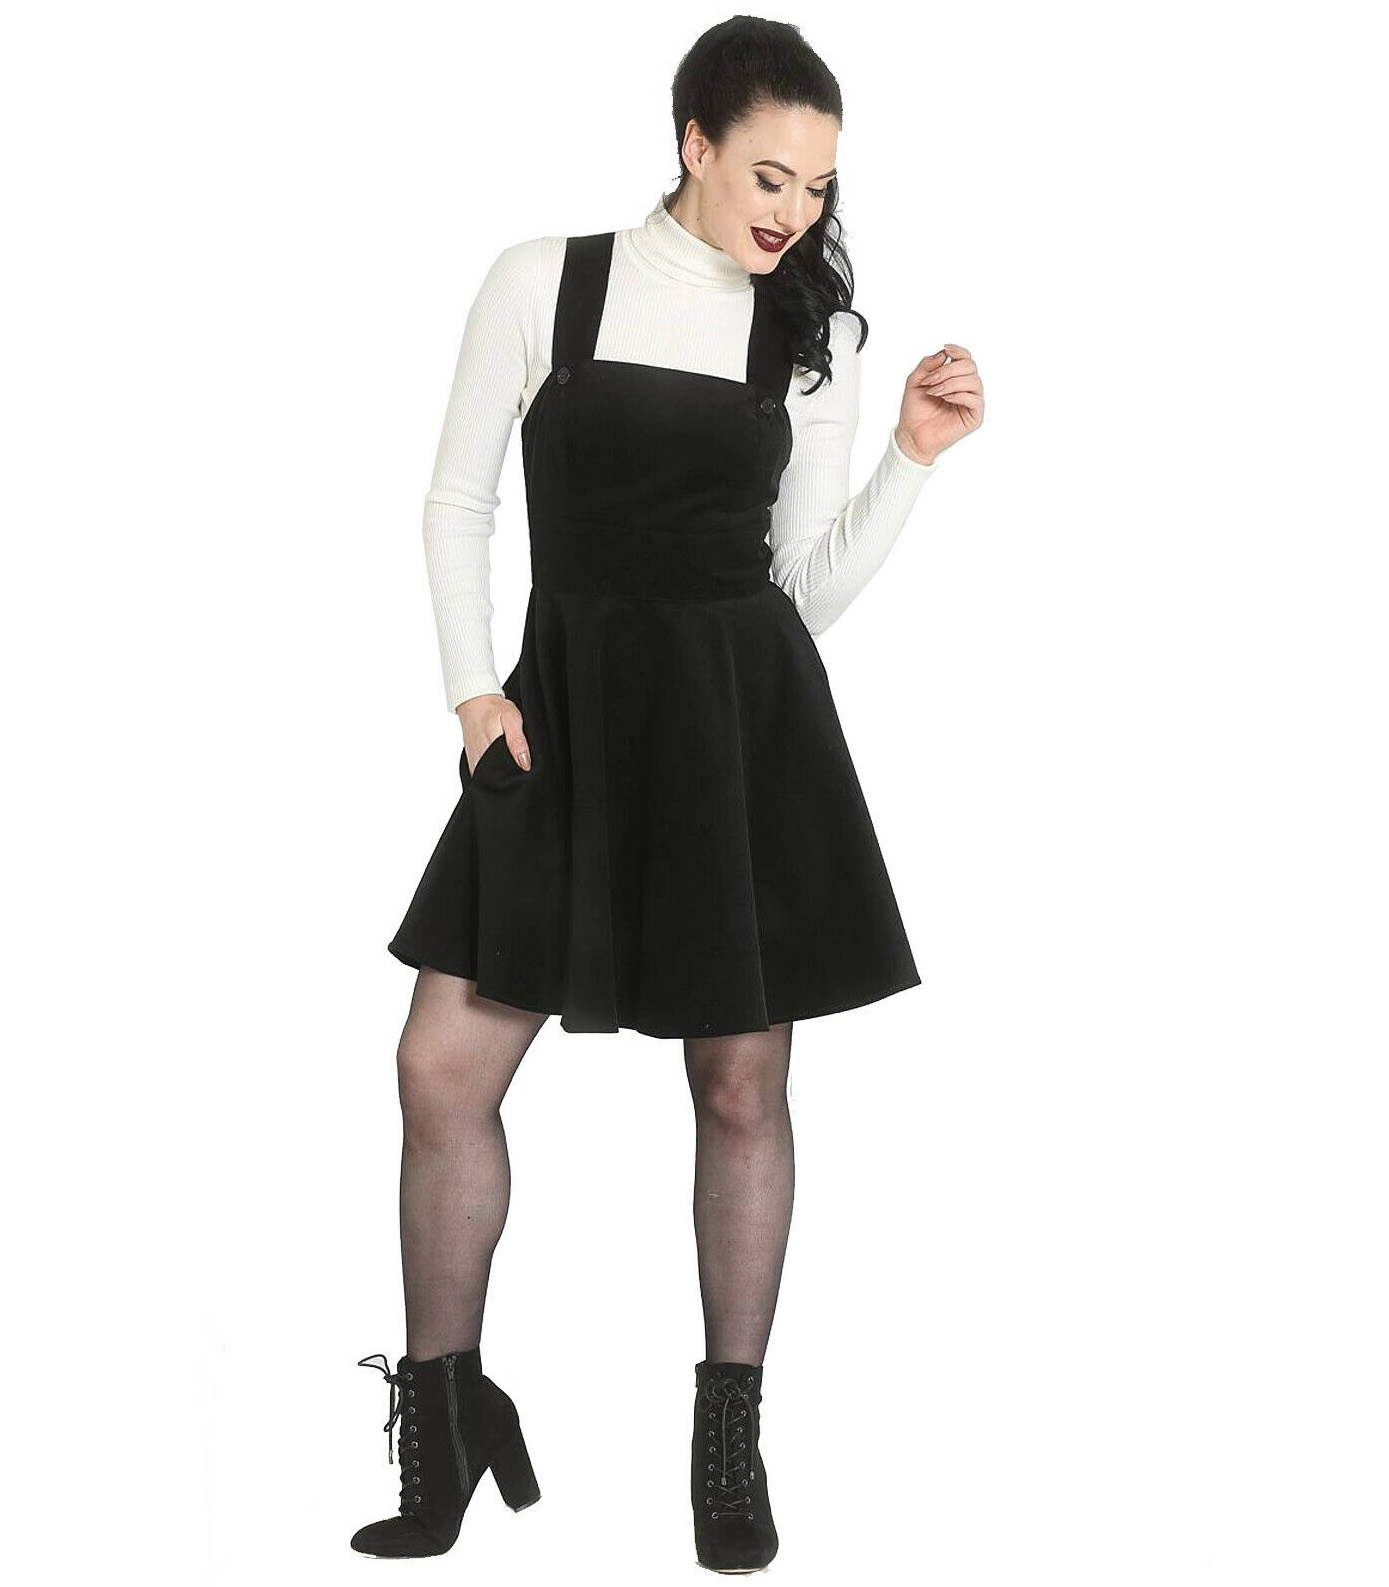 Hell-Bunny-Rockabilly-Corduroy-Mini-Dress-WONDER-YEARS-Pinafore-Black-All-Sizes thumbnail 27